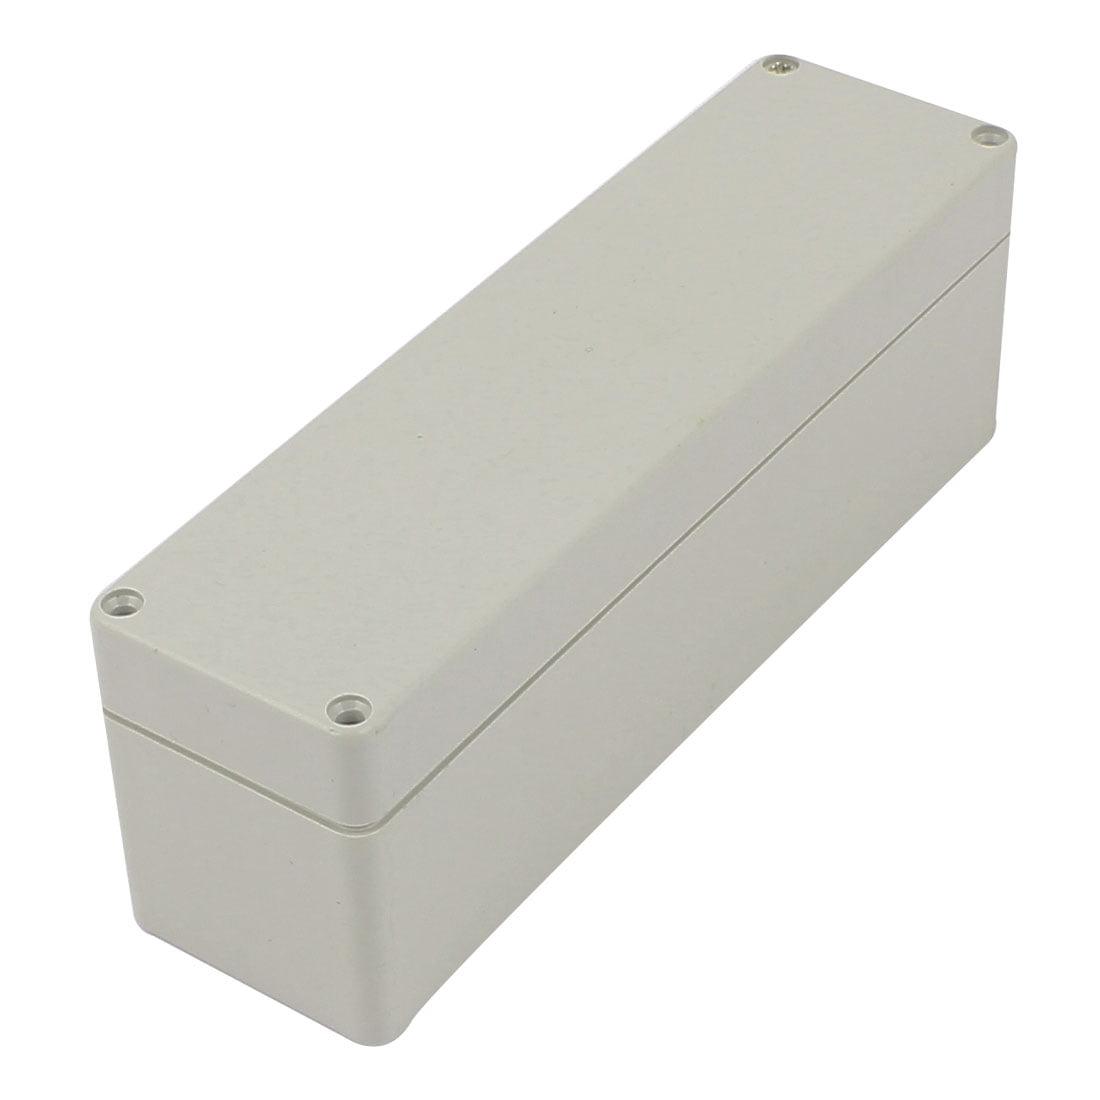 160mm x 45mm x 55mm Rectangular Waterproof Plastic DIY Junction Box Case - image 3 of 3